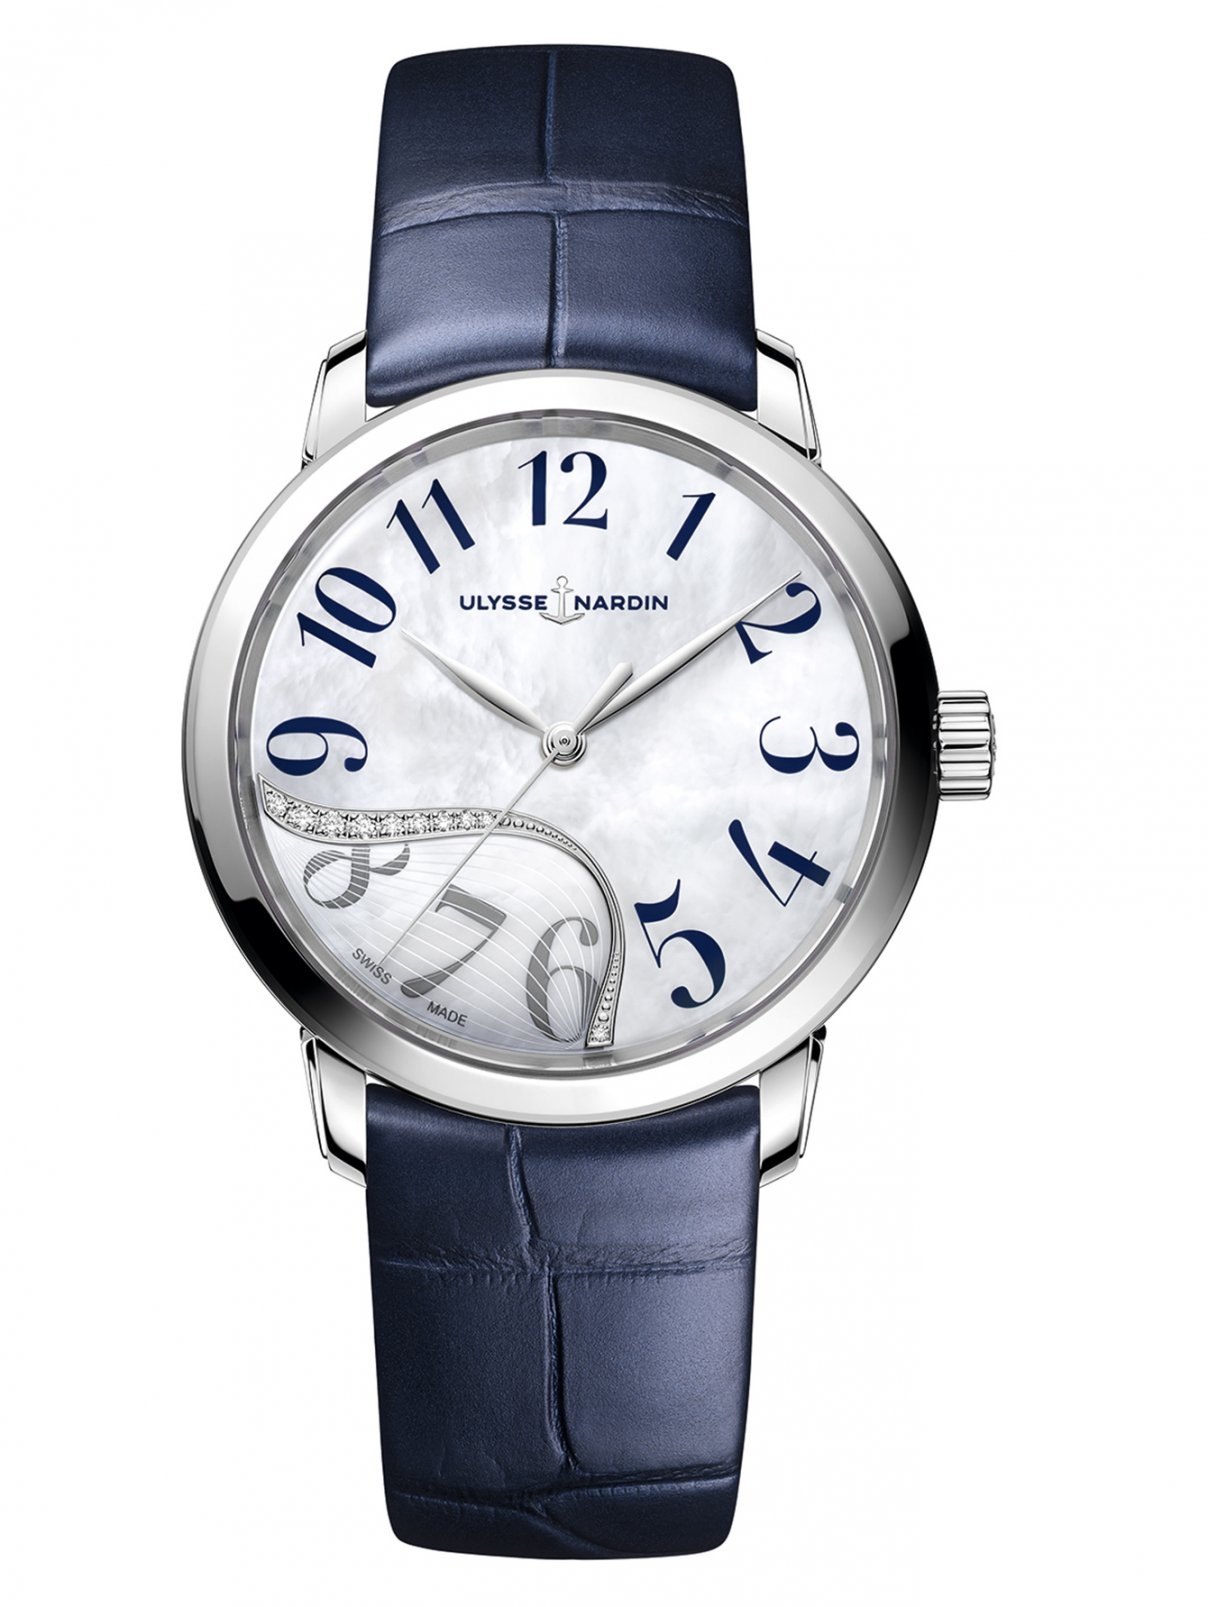 Часы 8153-201/60-03 Classic Jade Ulysse Nardin  –  Общий вид